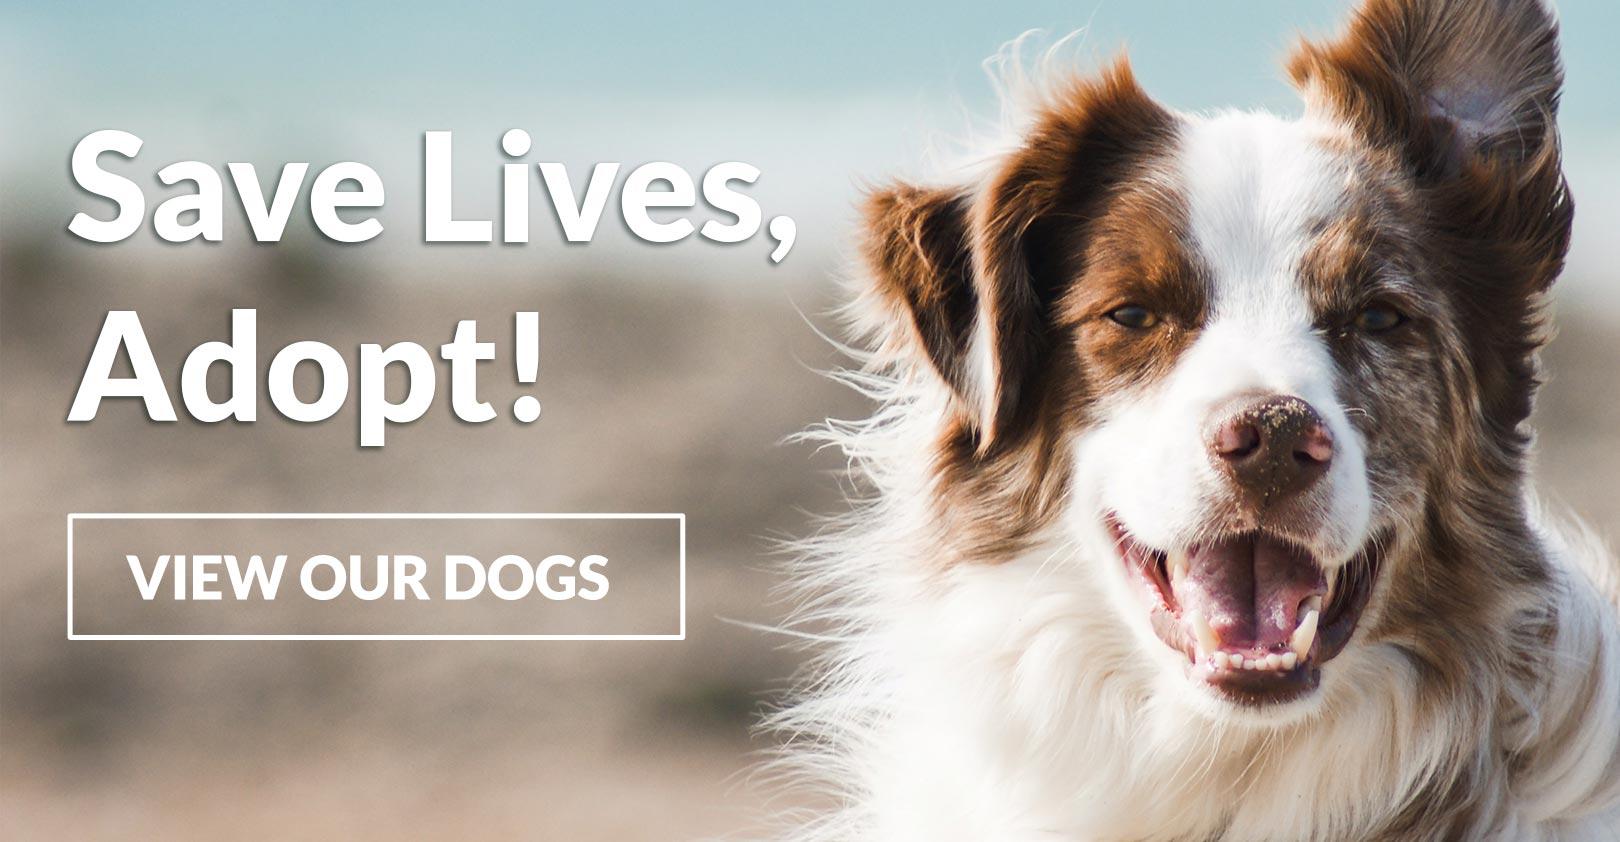 Save Lives - Adopt!